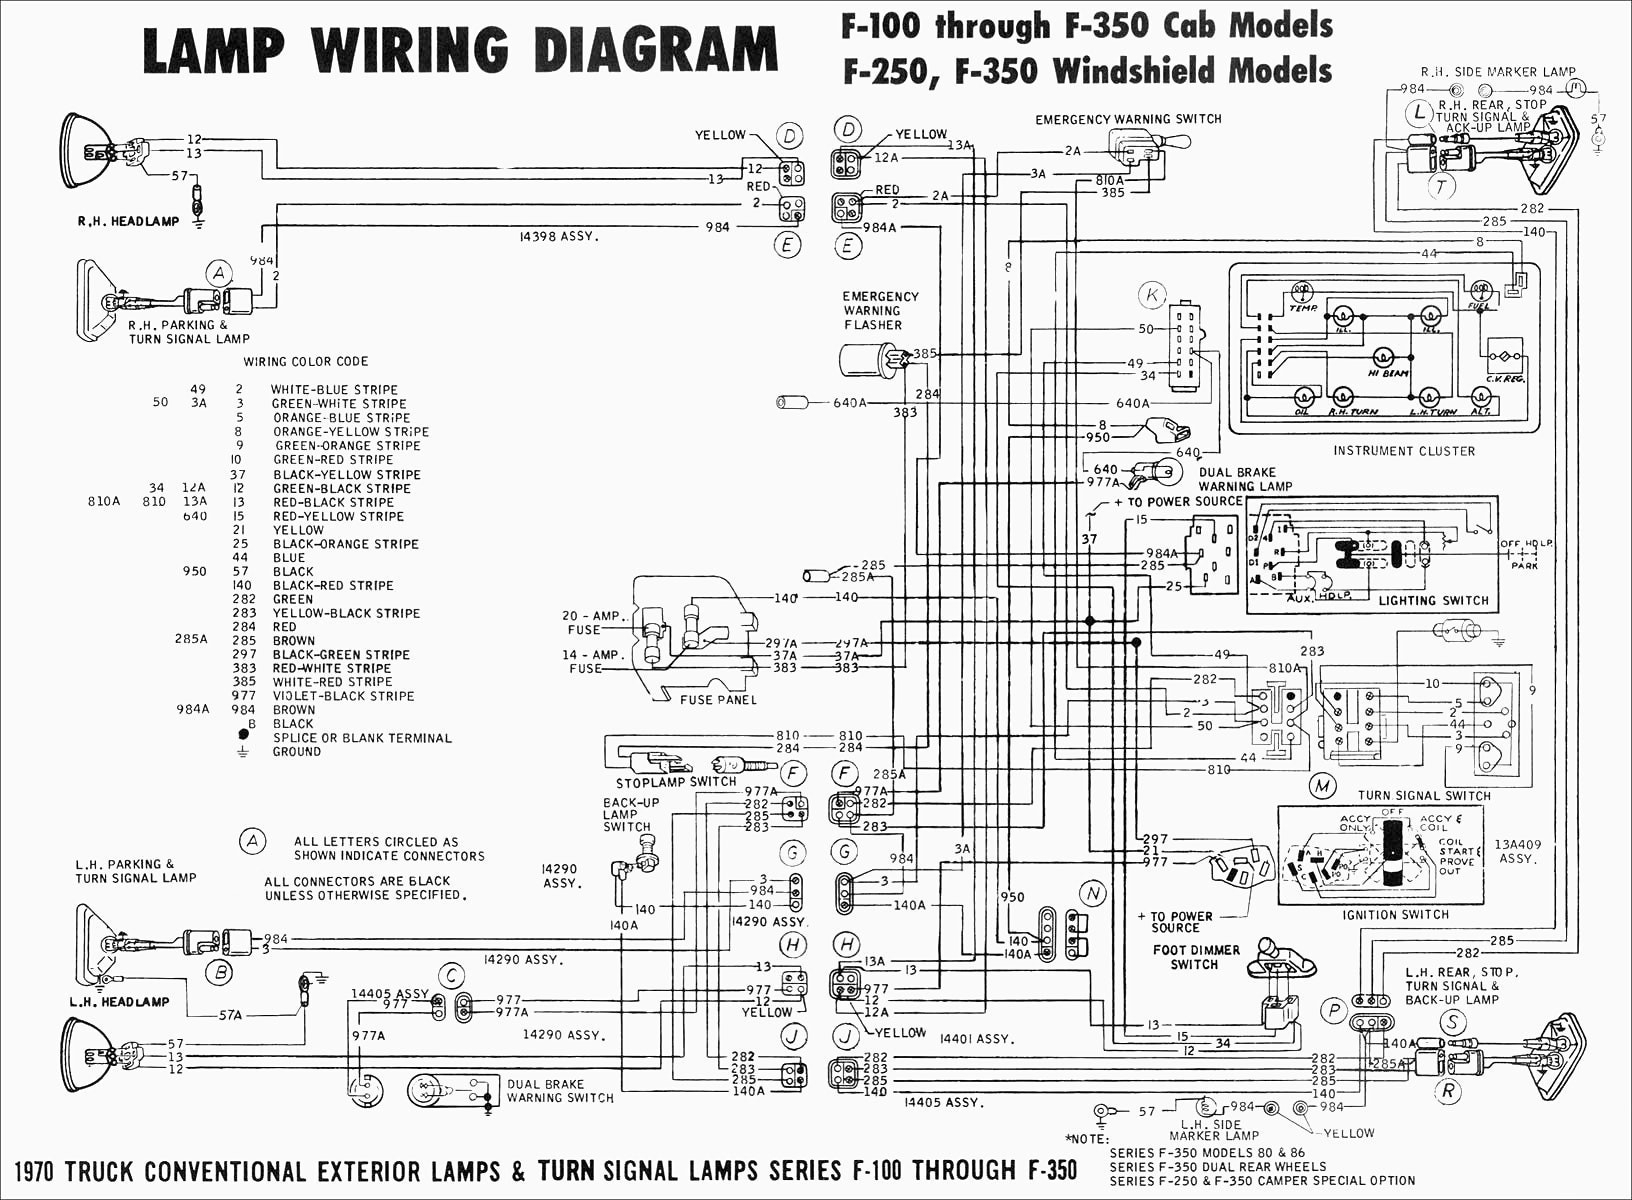 13an662g729 mtd wiring diagram